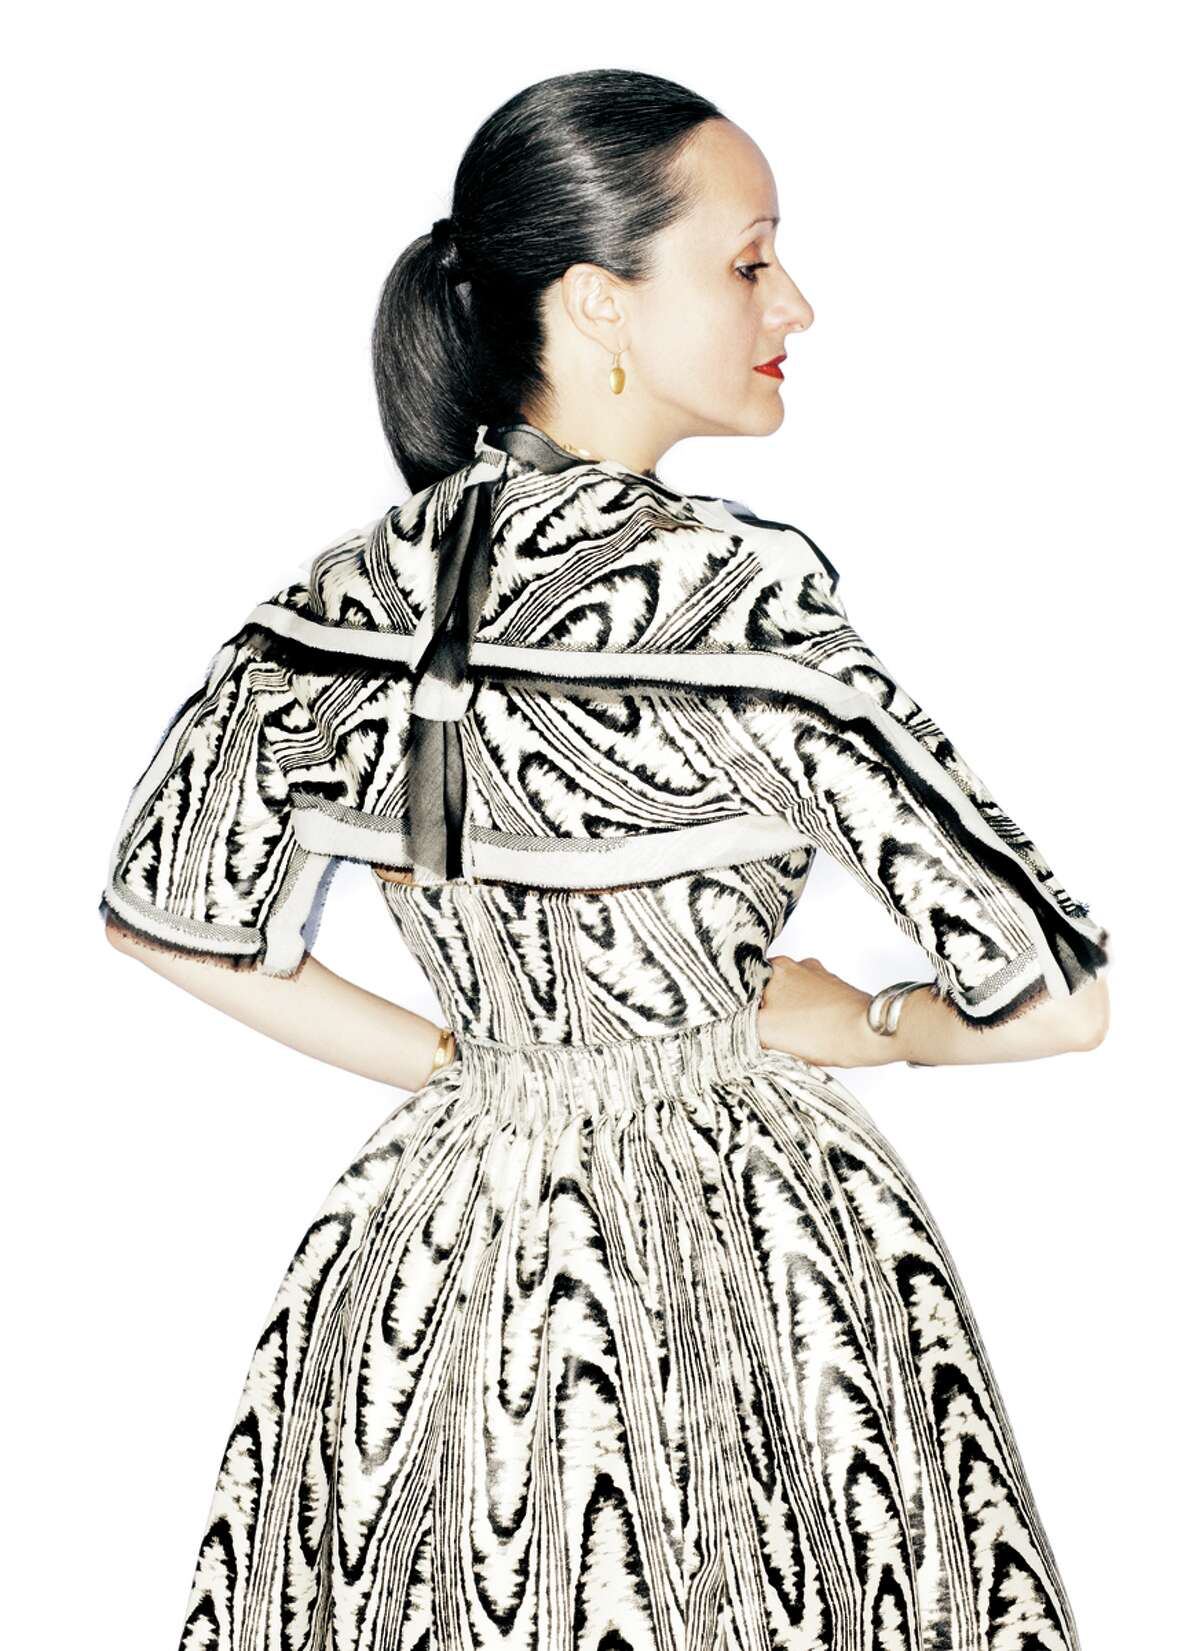 fashion: Designer Isabel Toledo. Credit: Randall Bachner